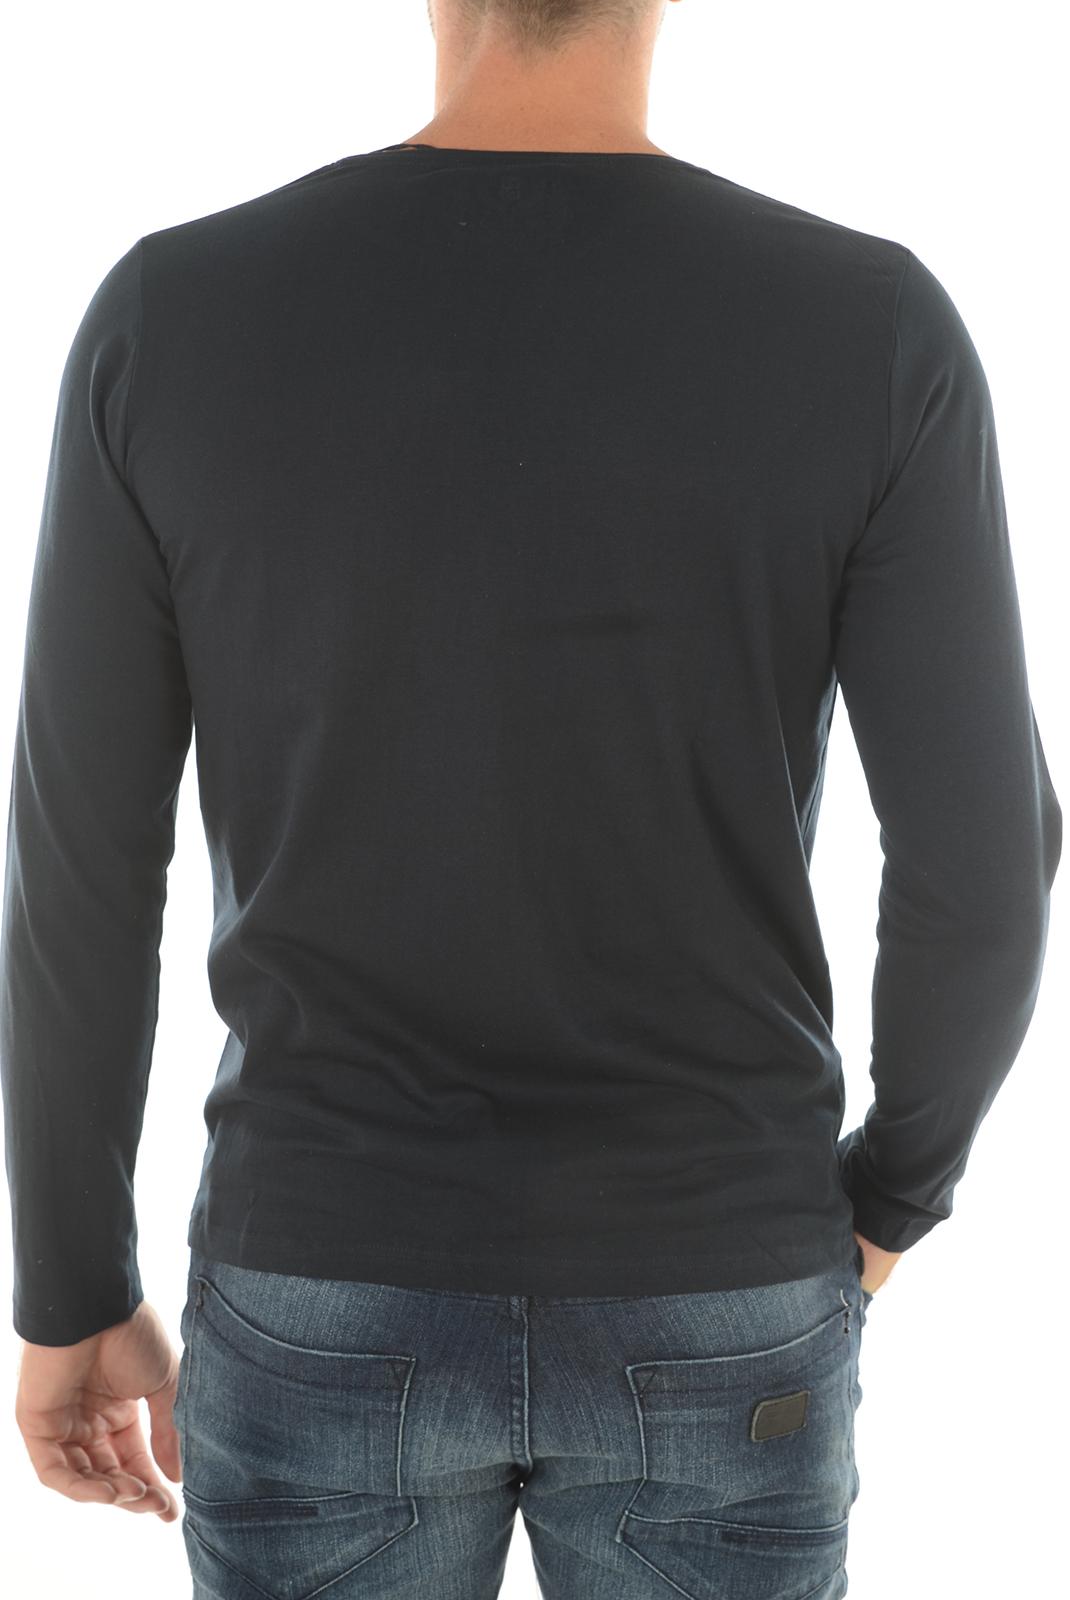 Tee-shirts  Biaggio jeans LEDANIL NAVY